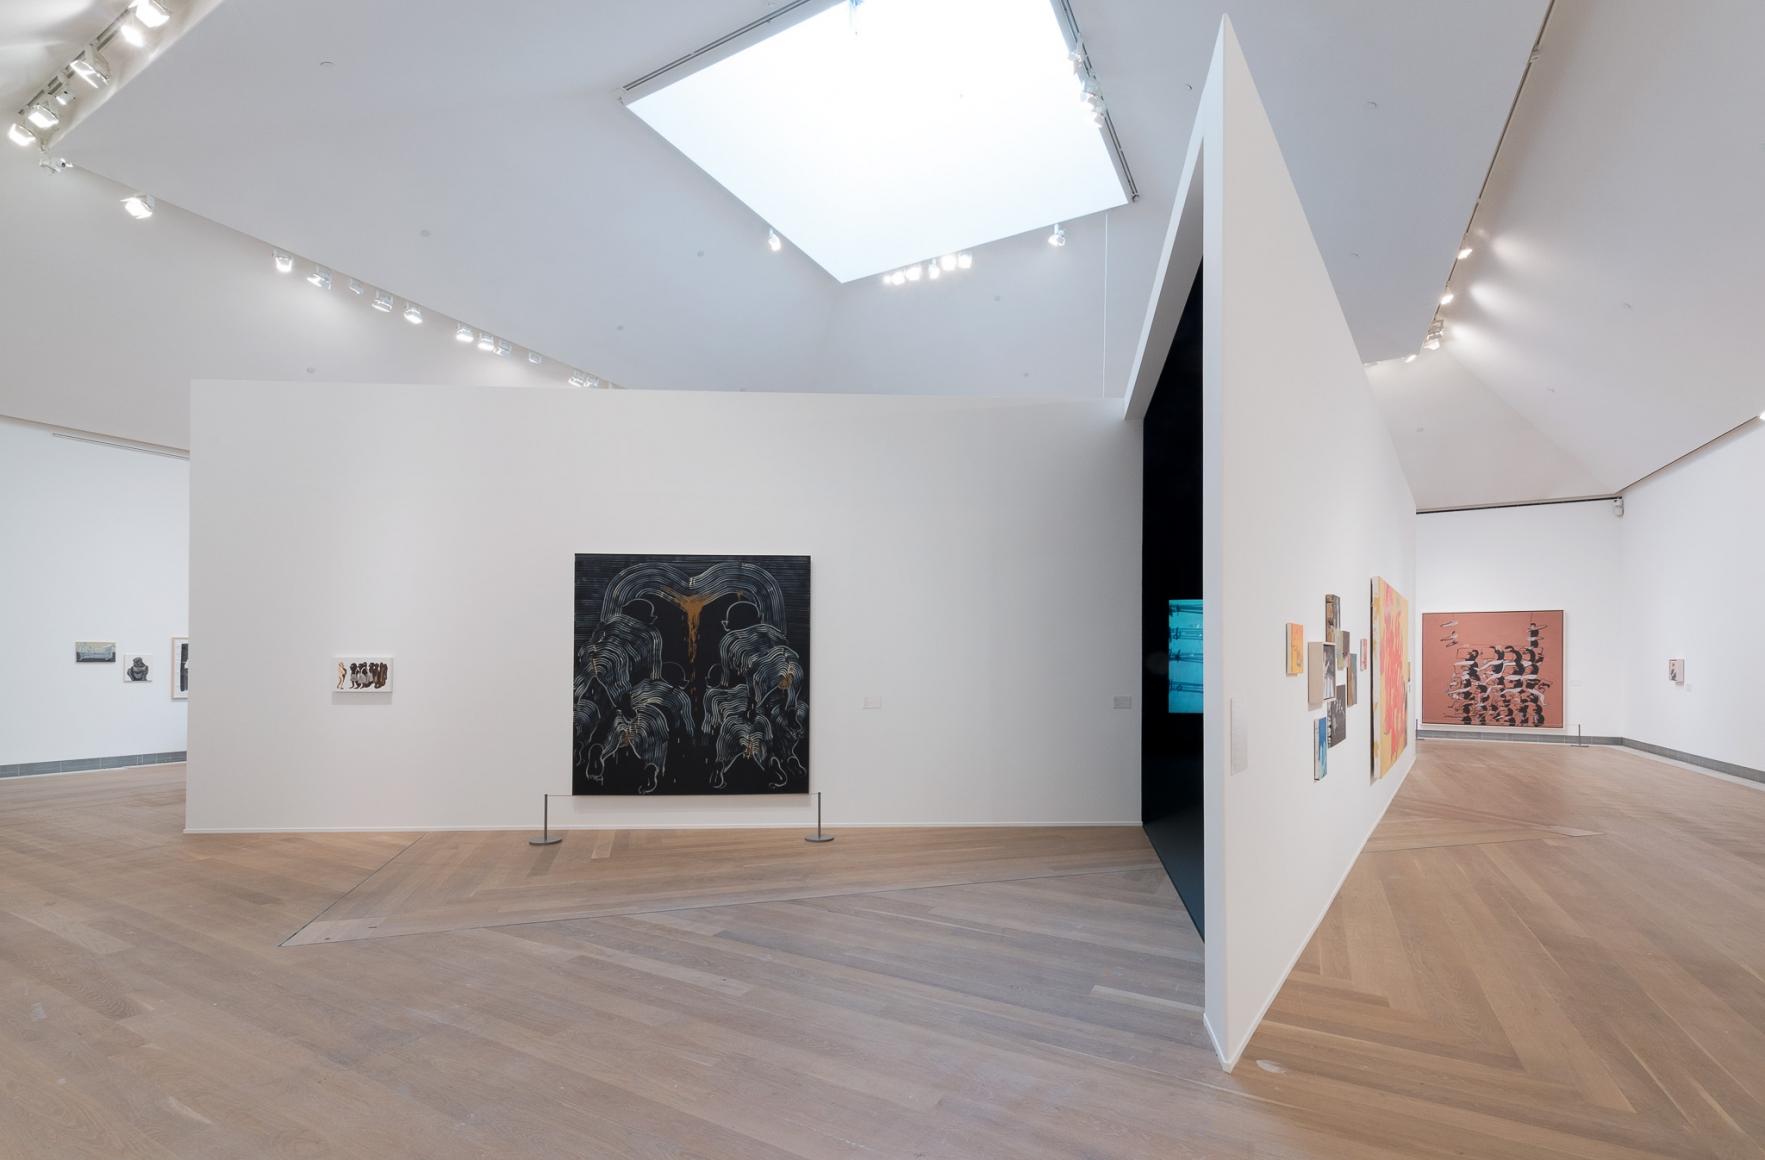 tala madani public exhibitions 303 gallery